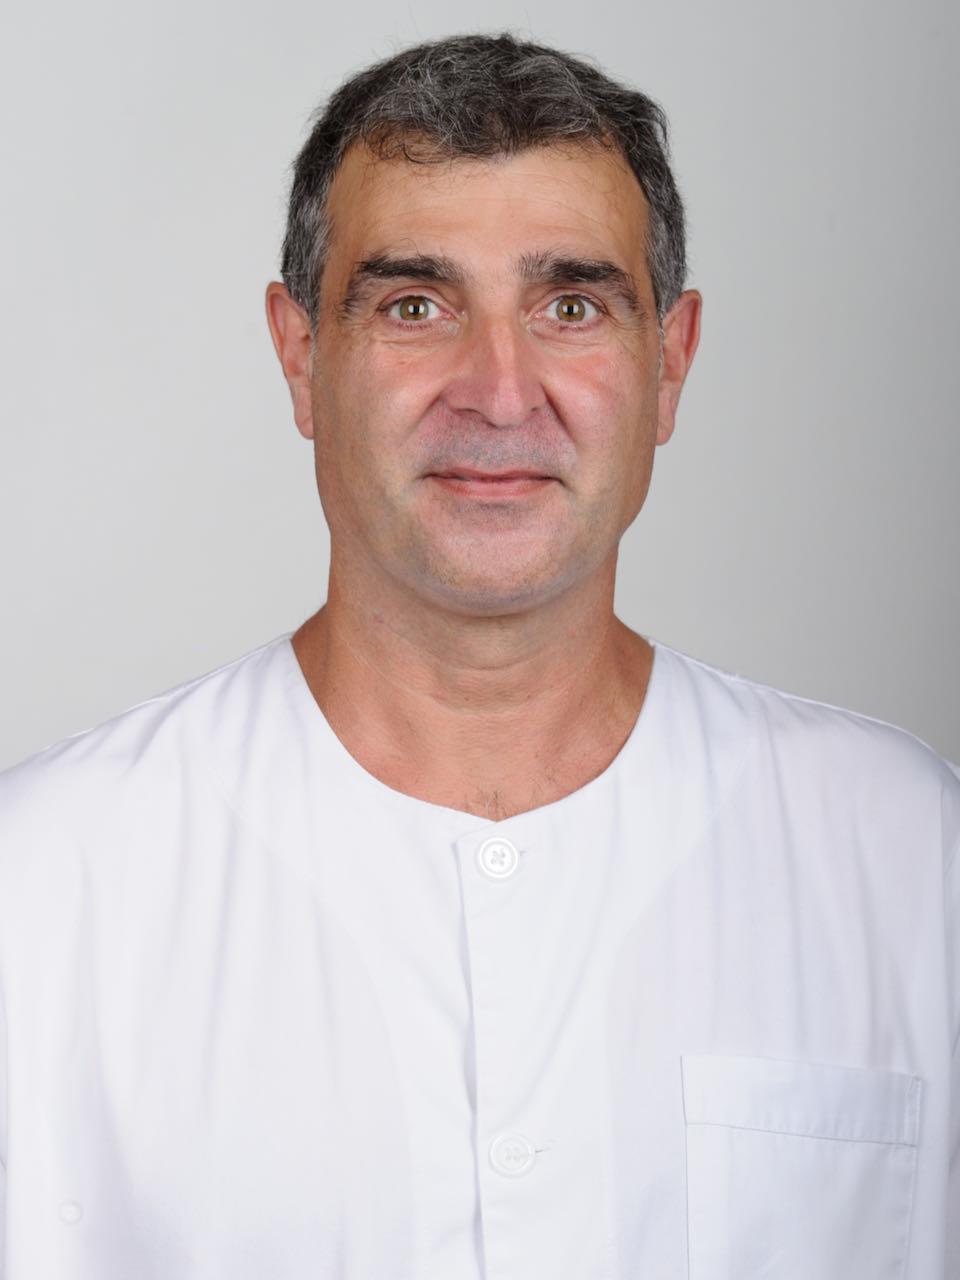 Sr. Jordi Tomas Munsó